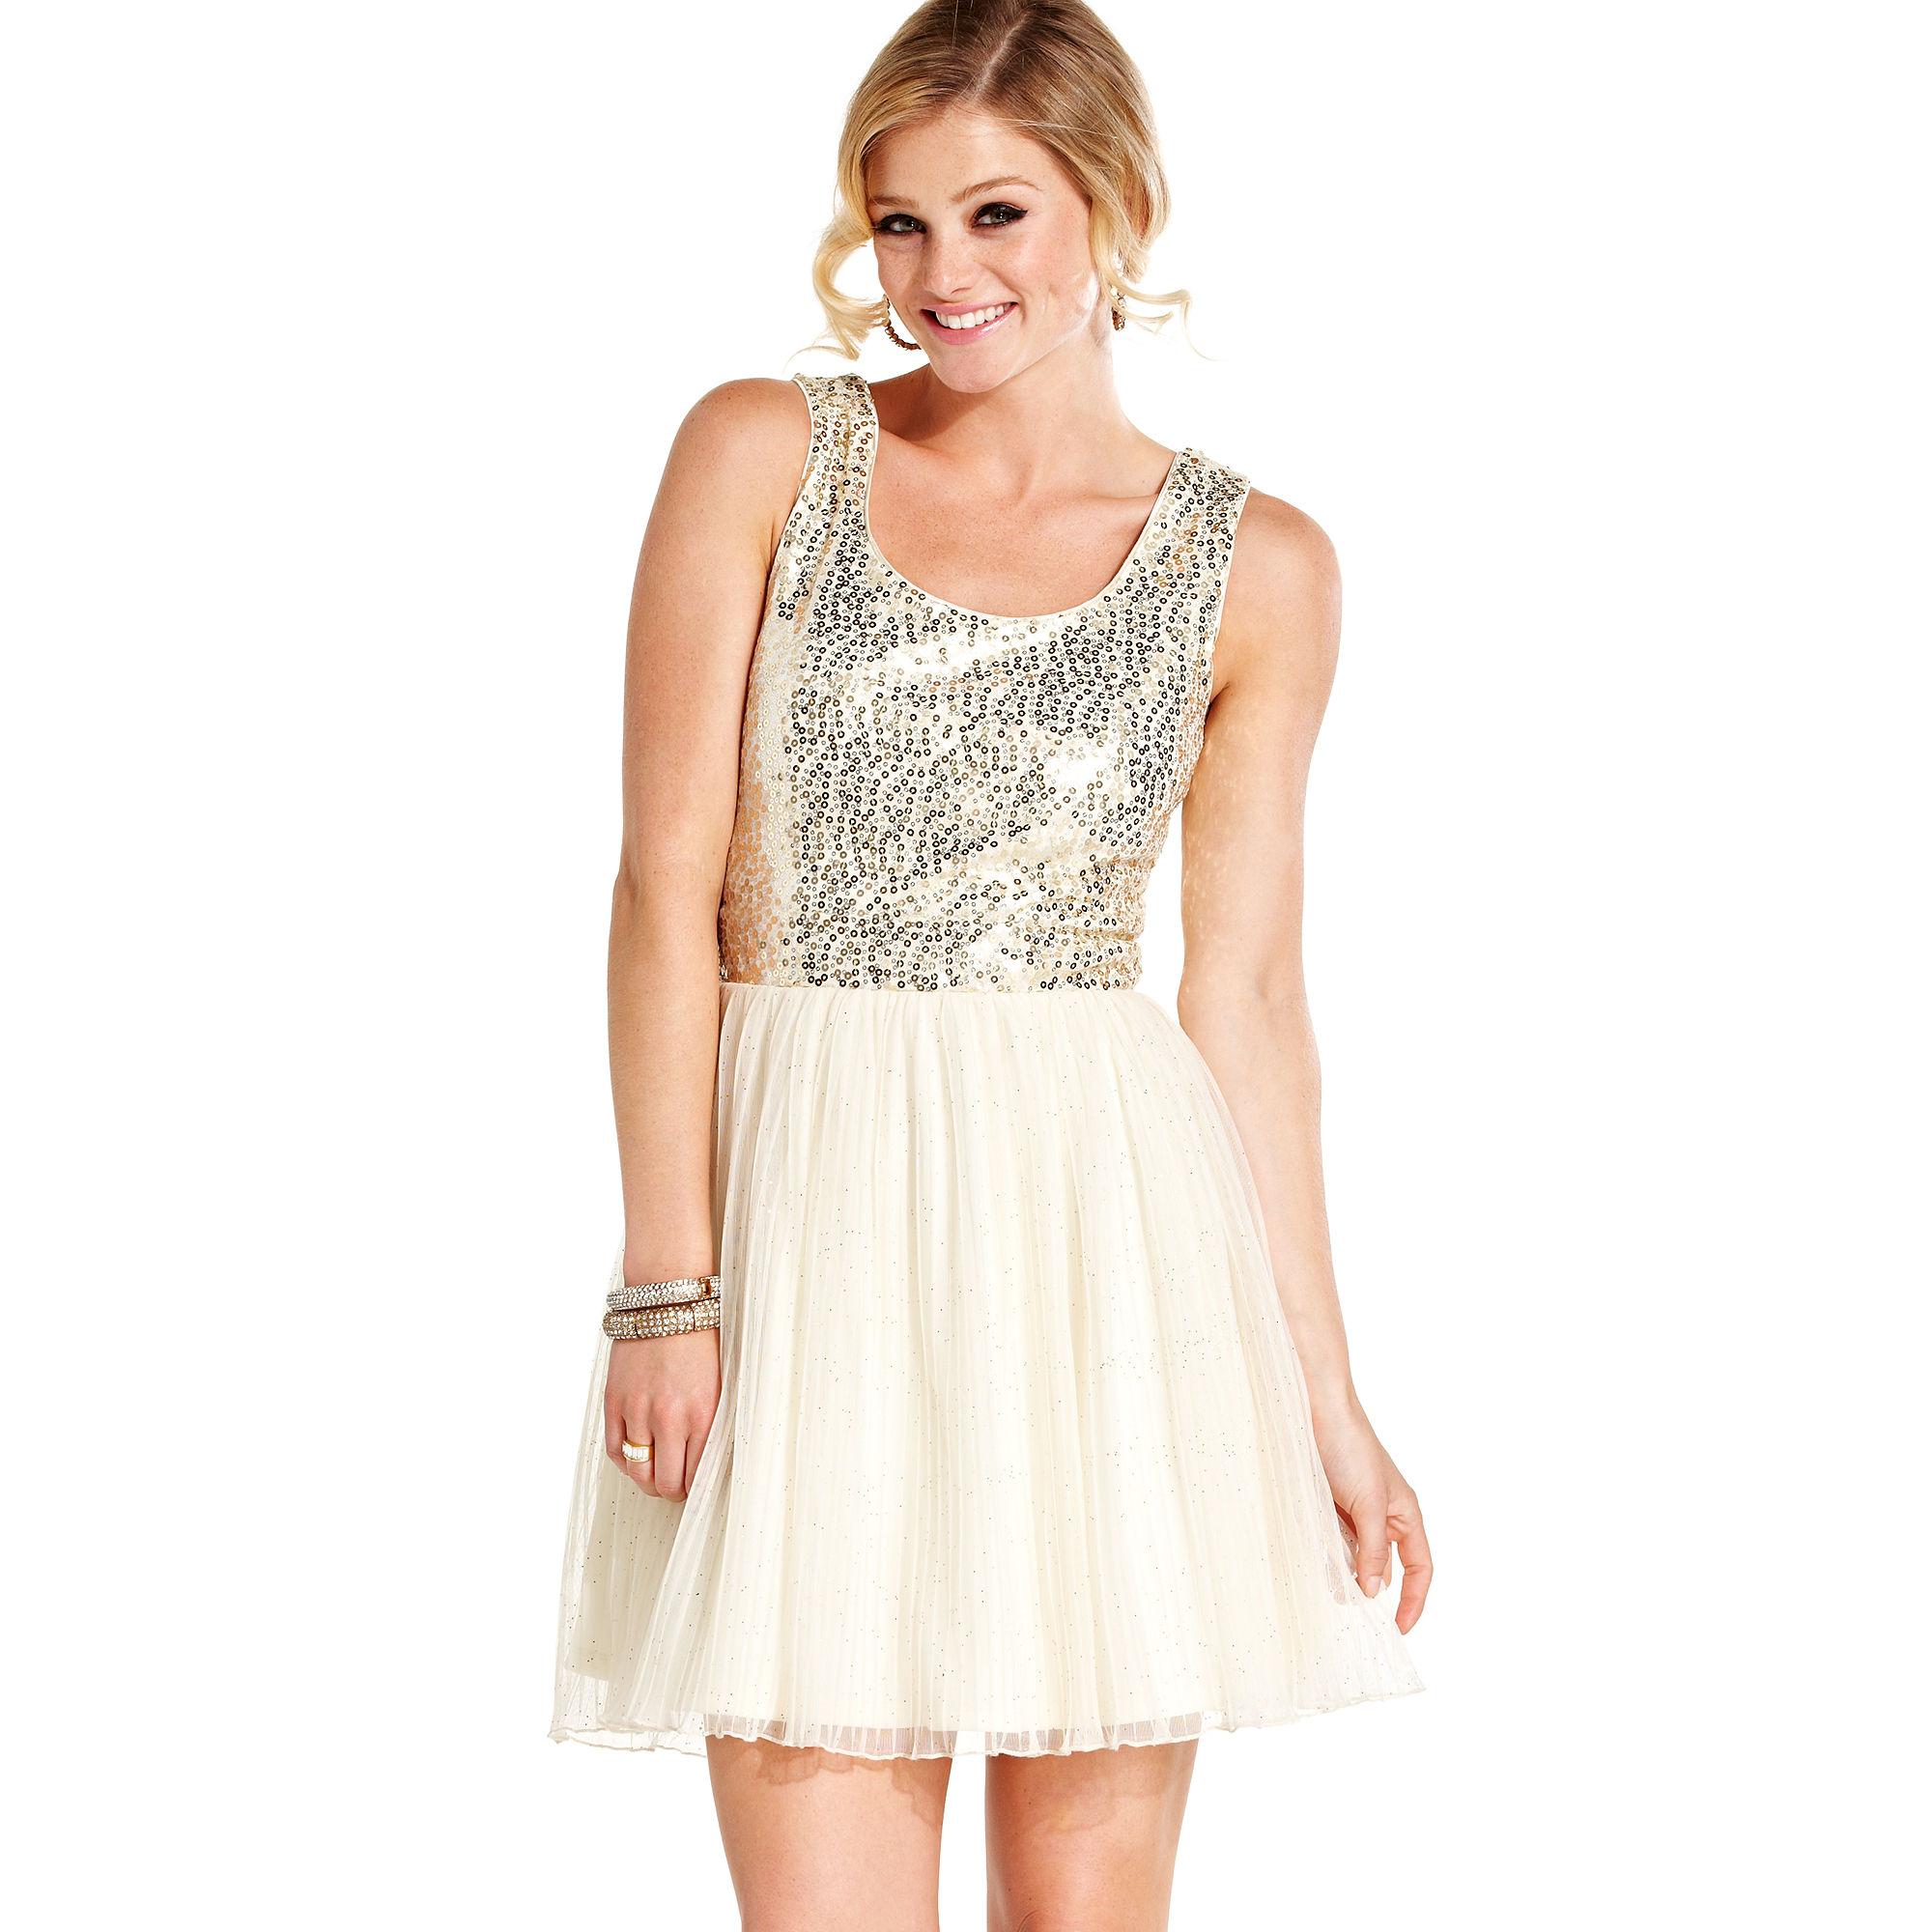 macy s bridesmaid dresses mn macy's wedding dresses Macy S Wedding Dresses Minneapolis Mn For